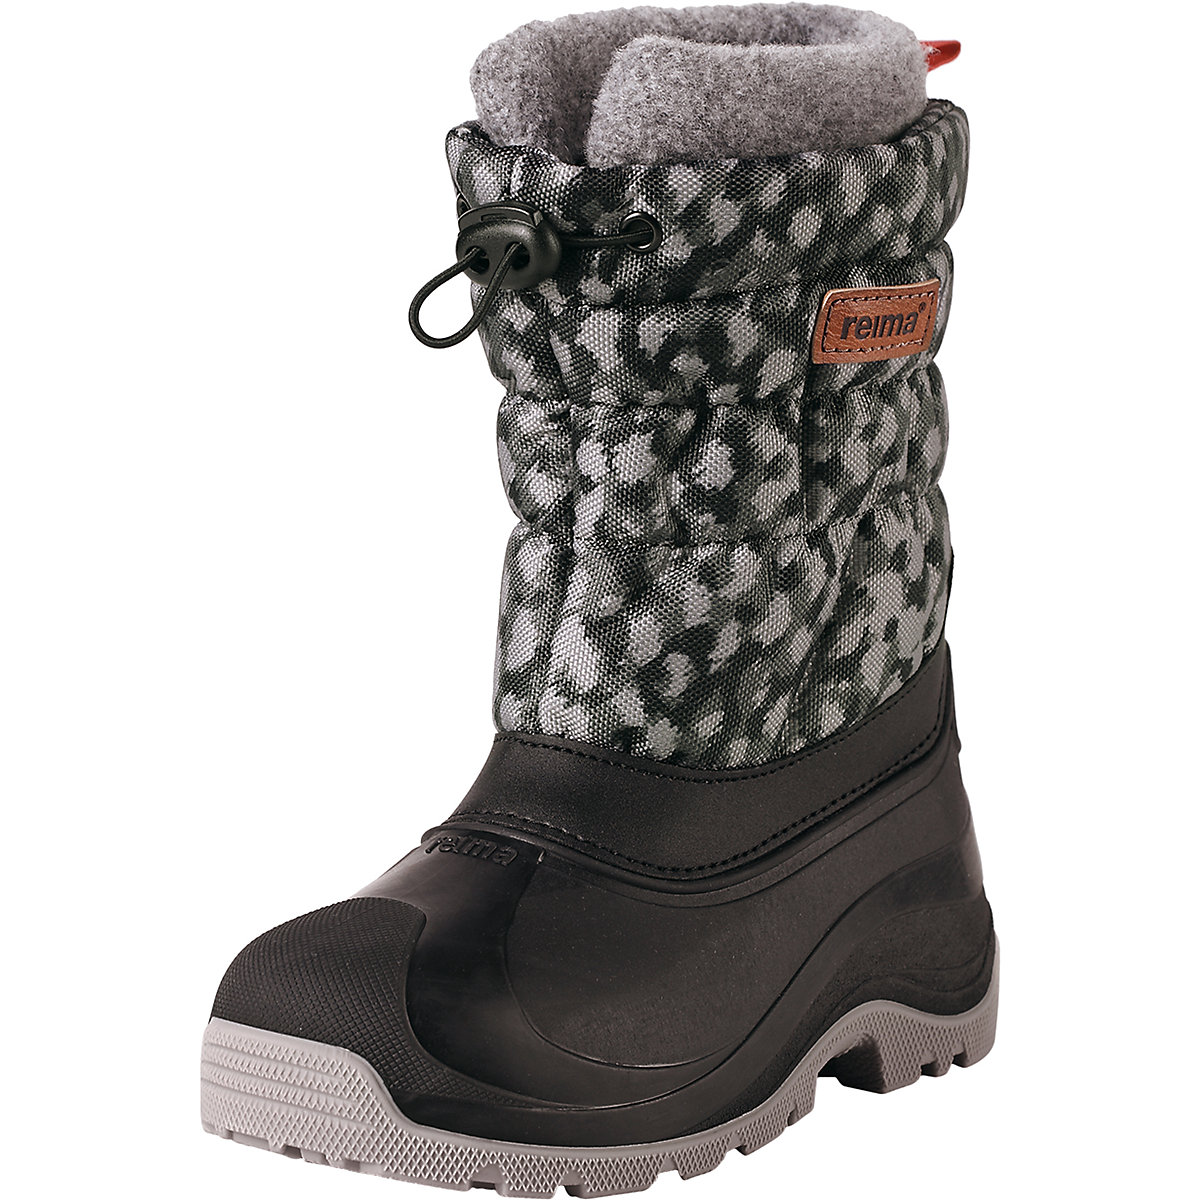 REIMA Boots 8624852 for boys winter boy  children shoes reima boots 8624963 for boys winter boy baby shoes